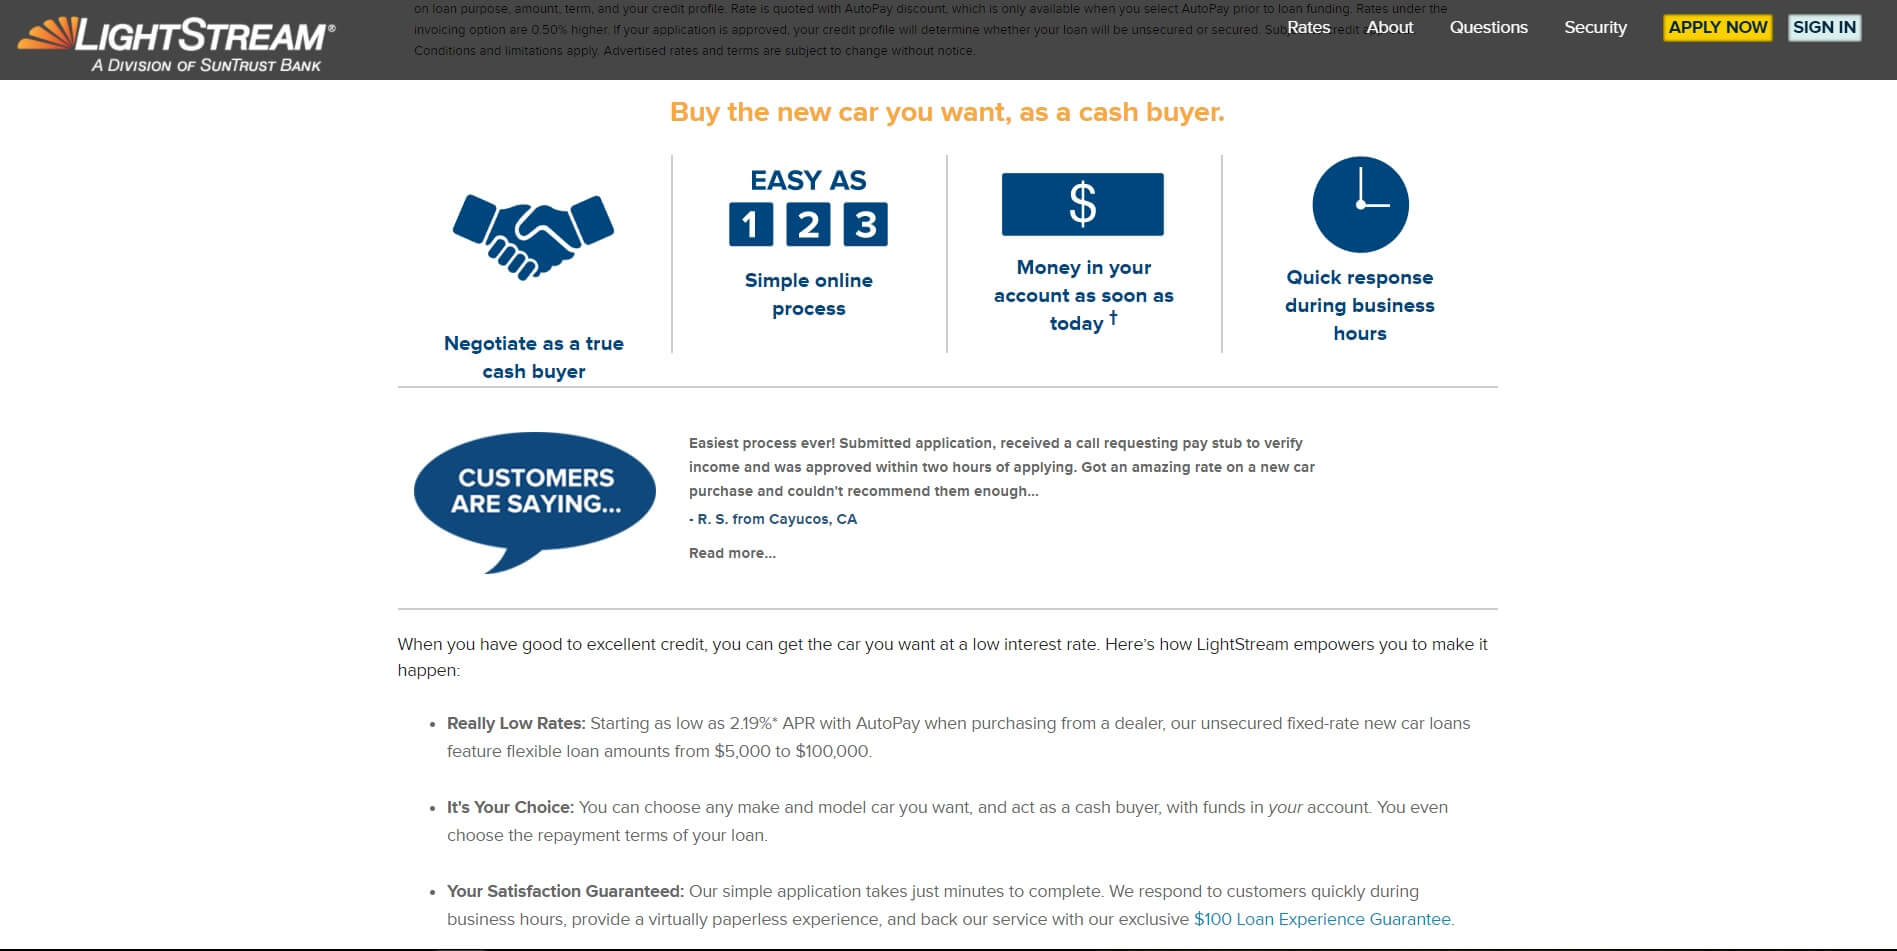 Lightstream Car Loan Reviews